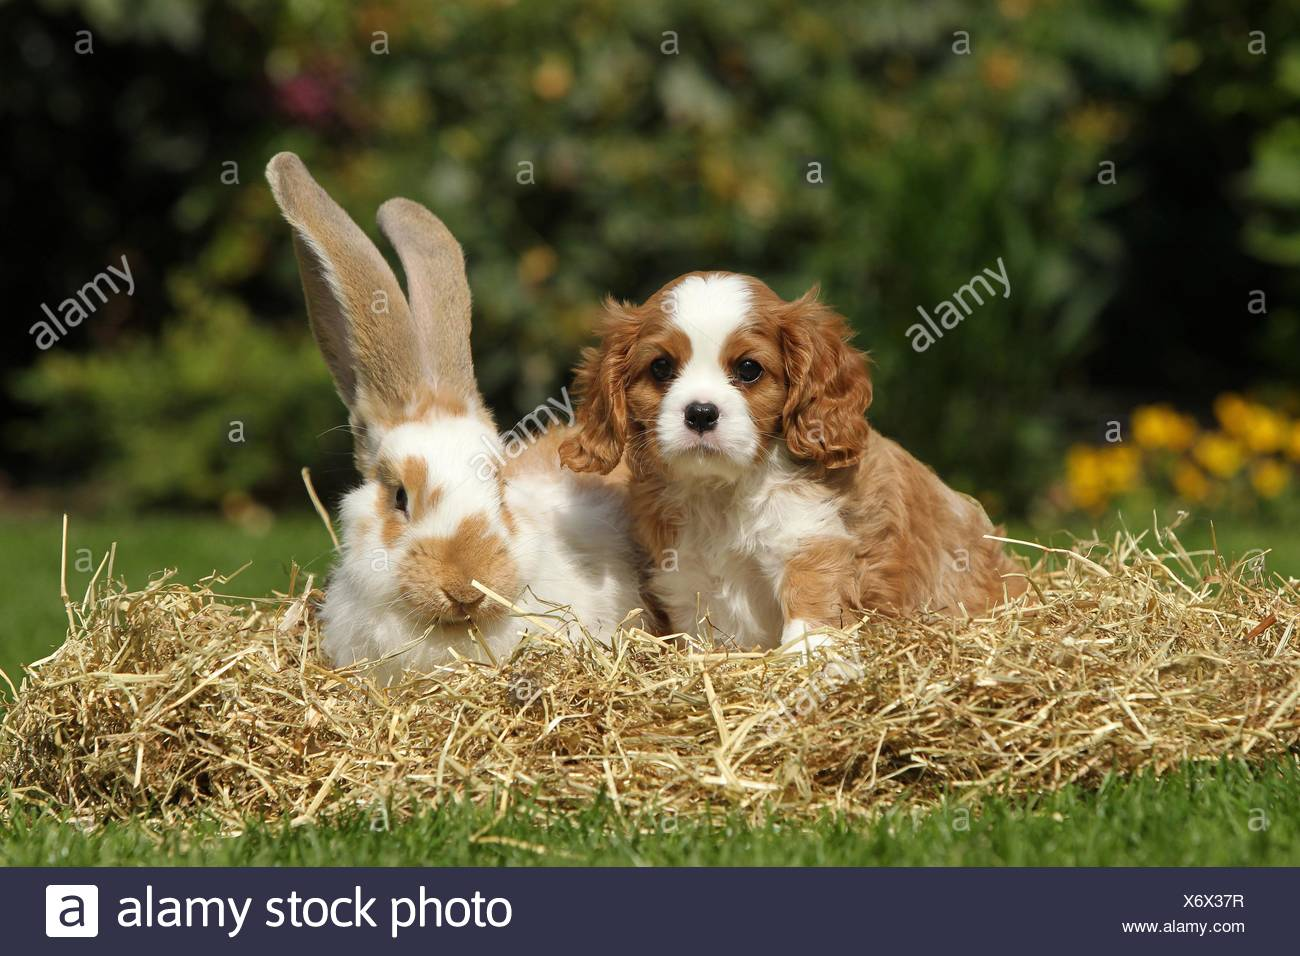 dog and rabbit - Stock Image